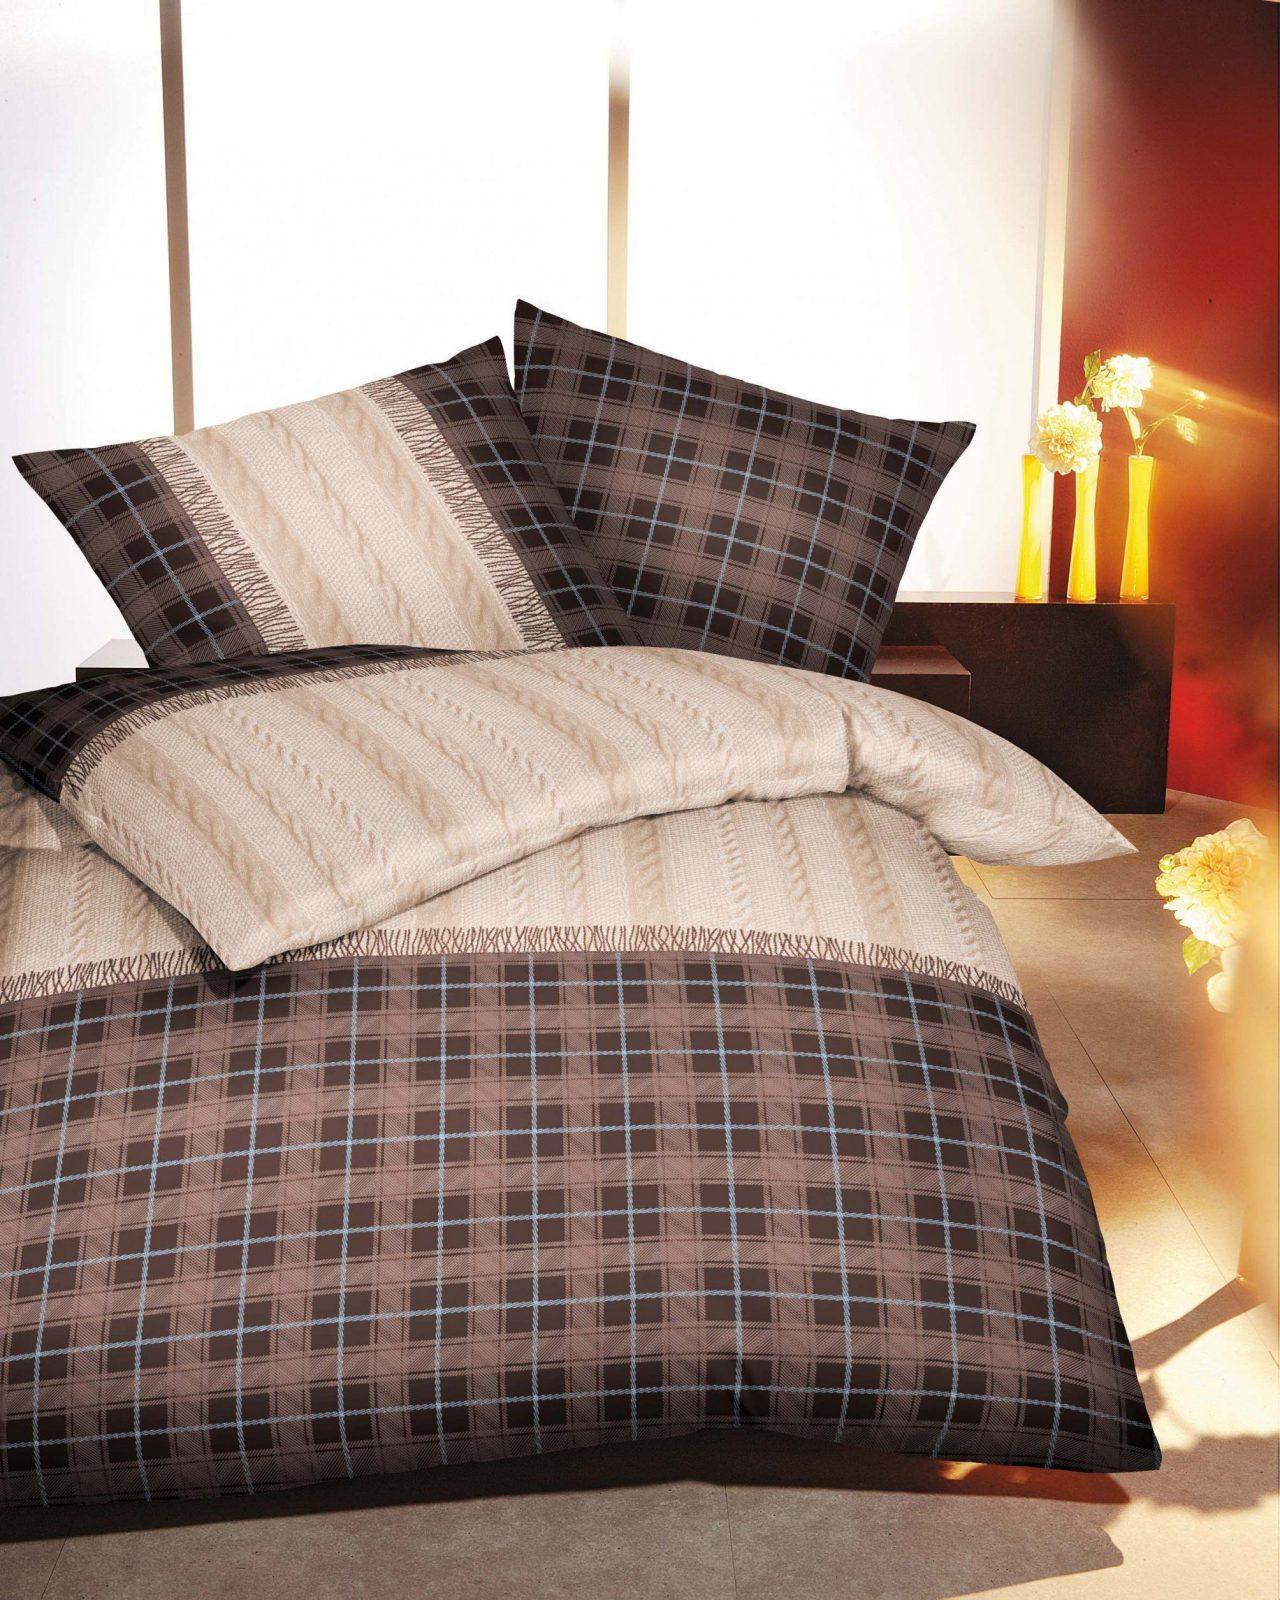 Impressive Bettwäsche Bedrucken Lassen Luxuriös Wo Kann Man Ideen von Bettwäsche Selbst Bedrucken Photo